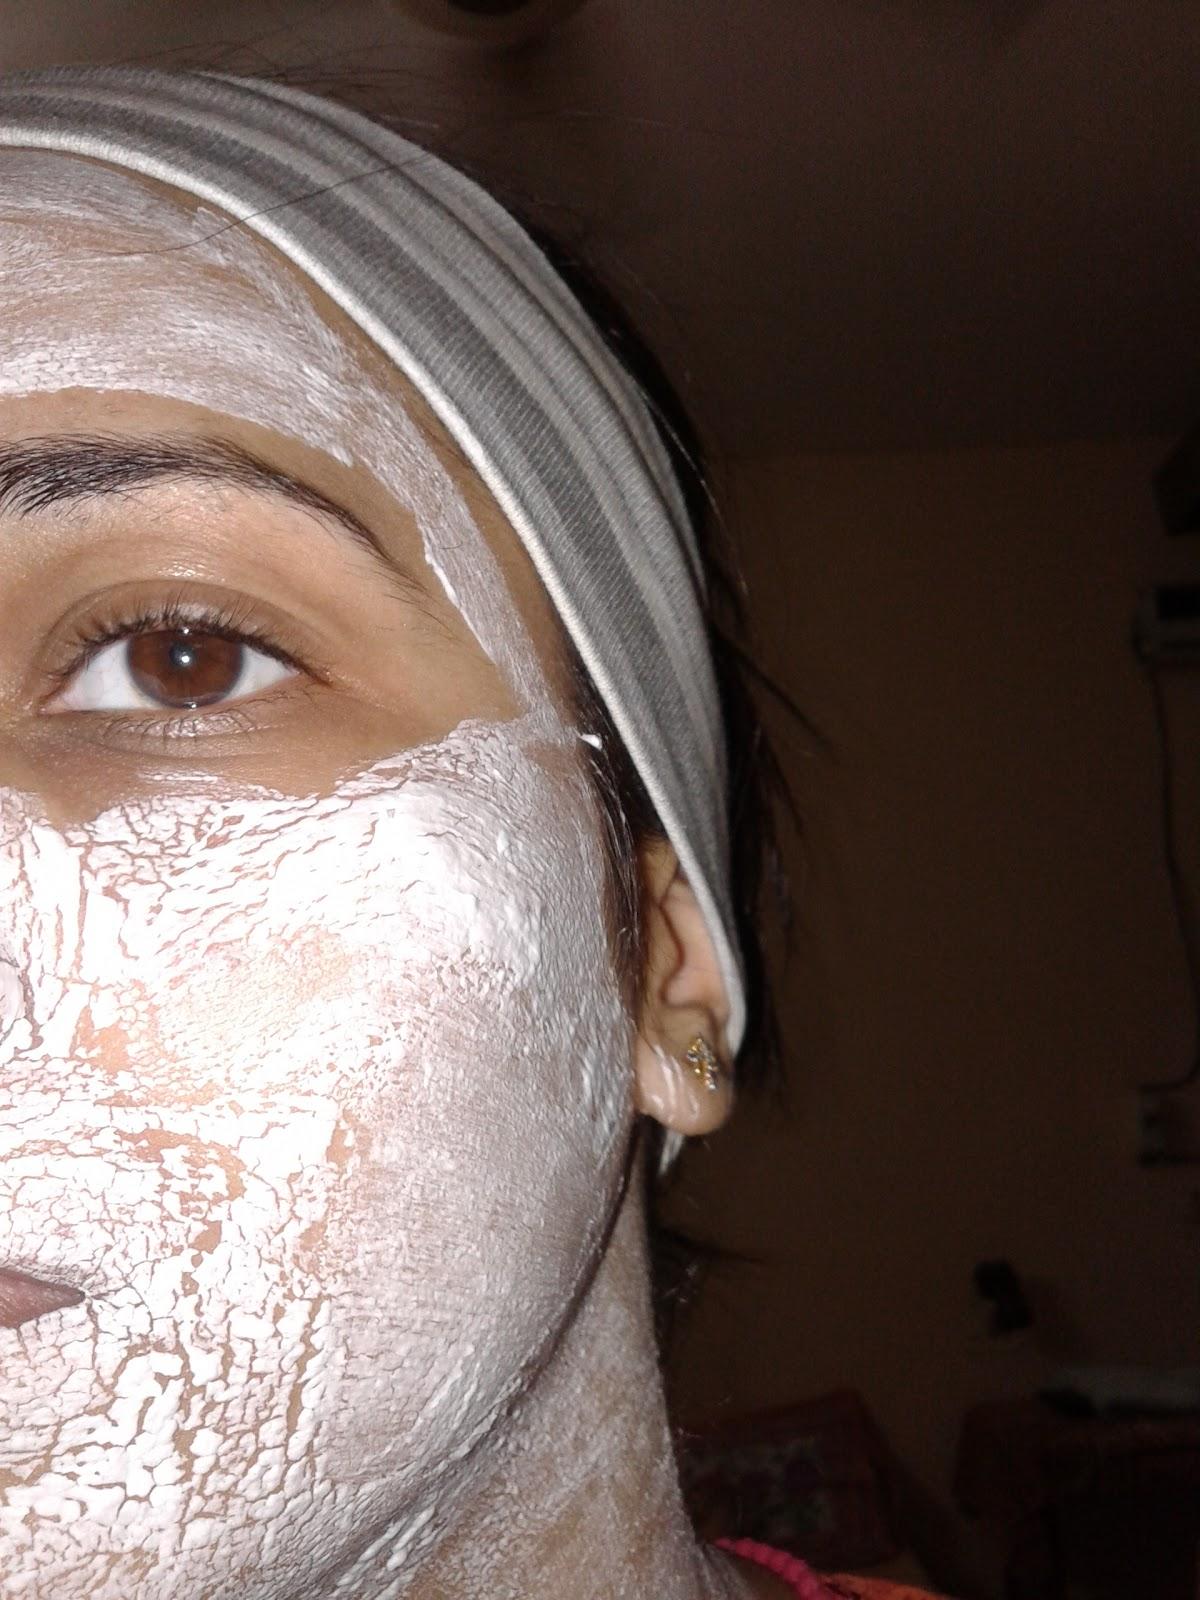 http://1.bp.blogspot.com/-p-R-bJhR62o/UXfpiBNbLSI/AAAAAAAAGy8/185rVAh7U0Y/s1600/Face+bleach.jpg